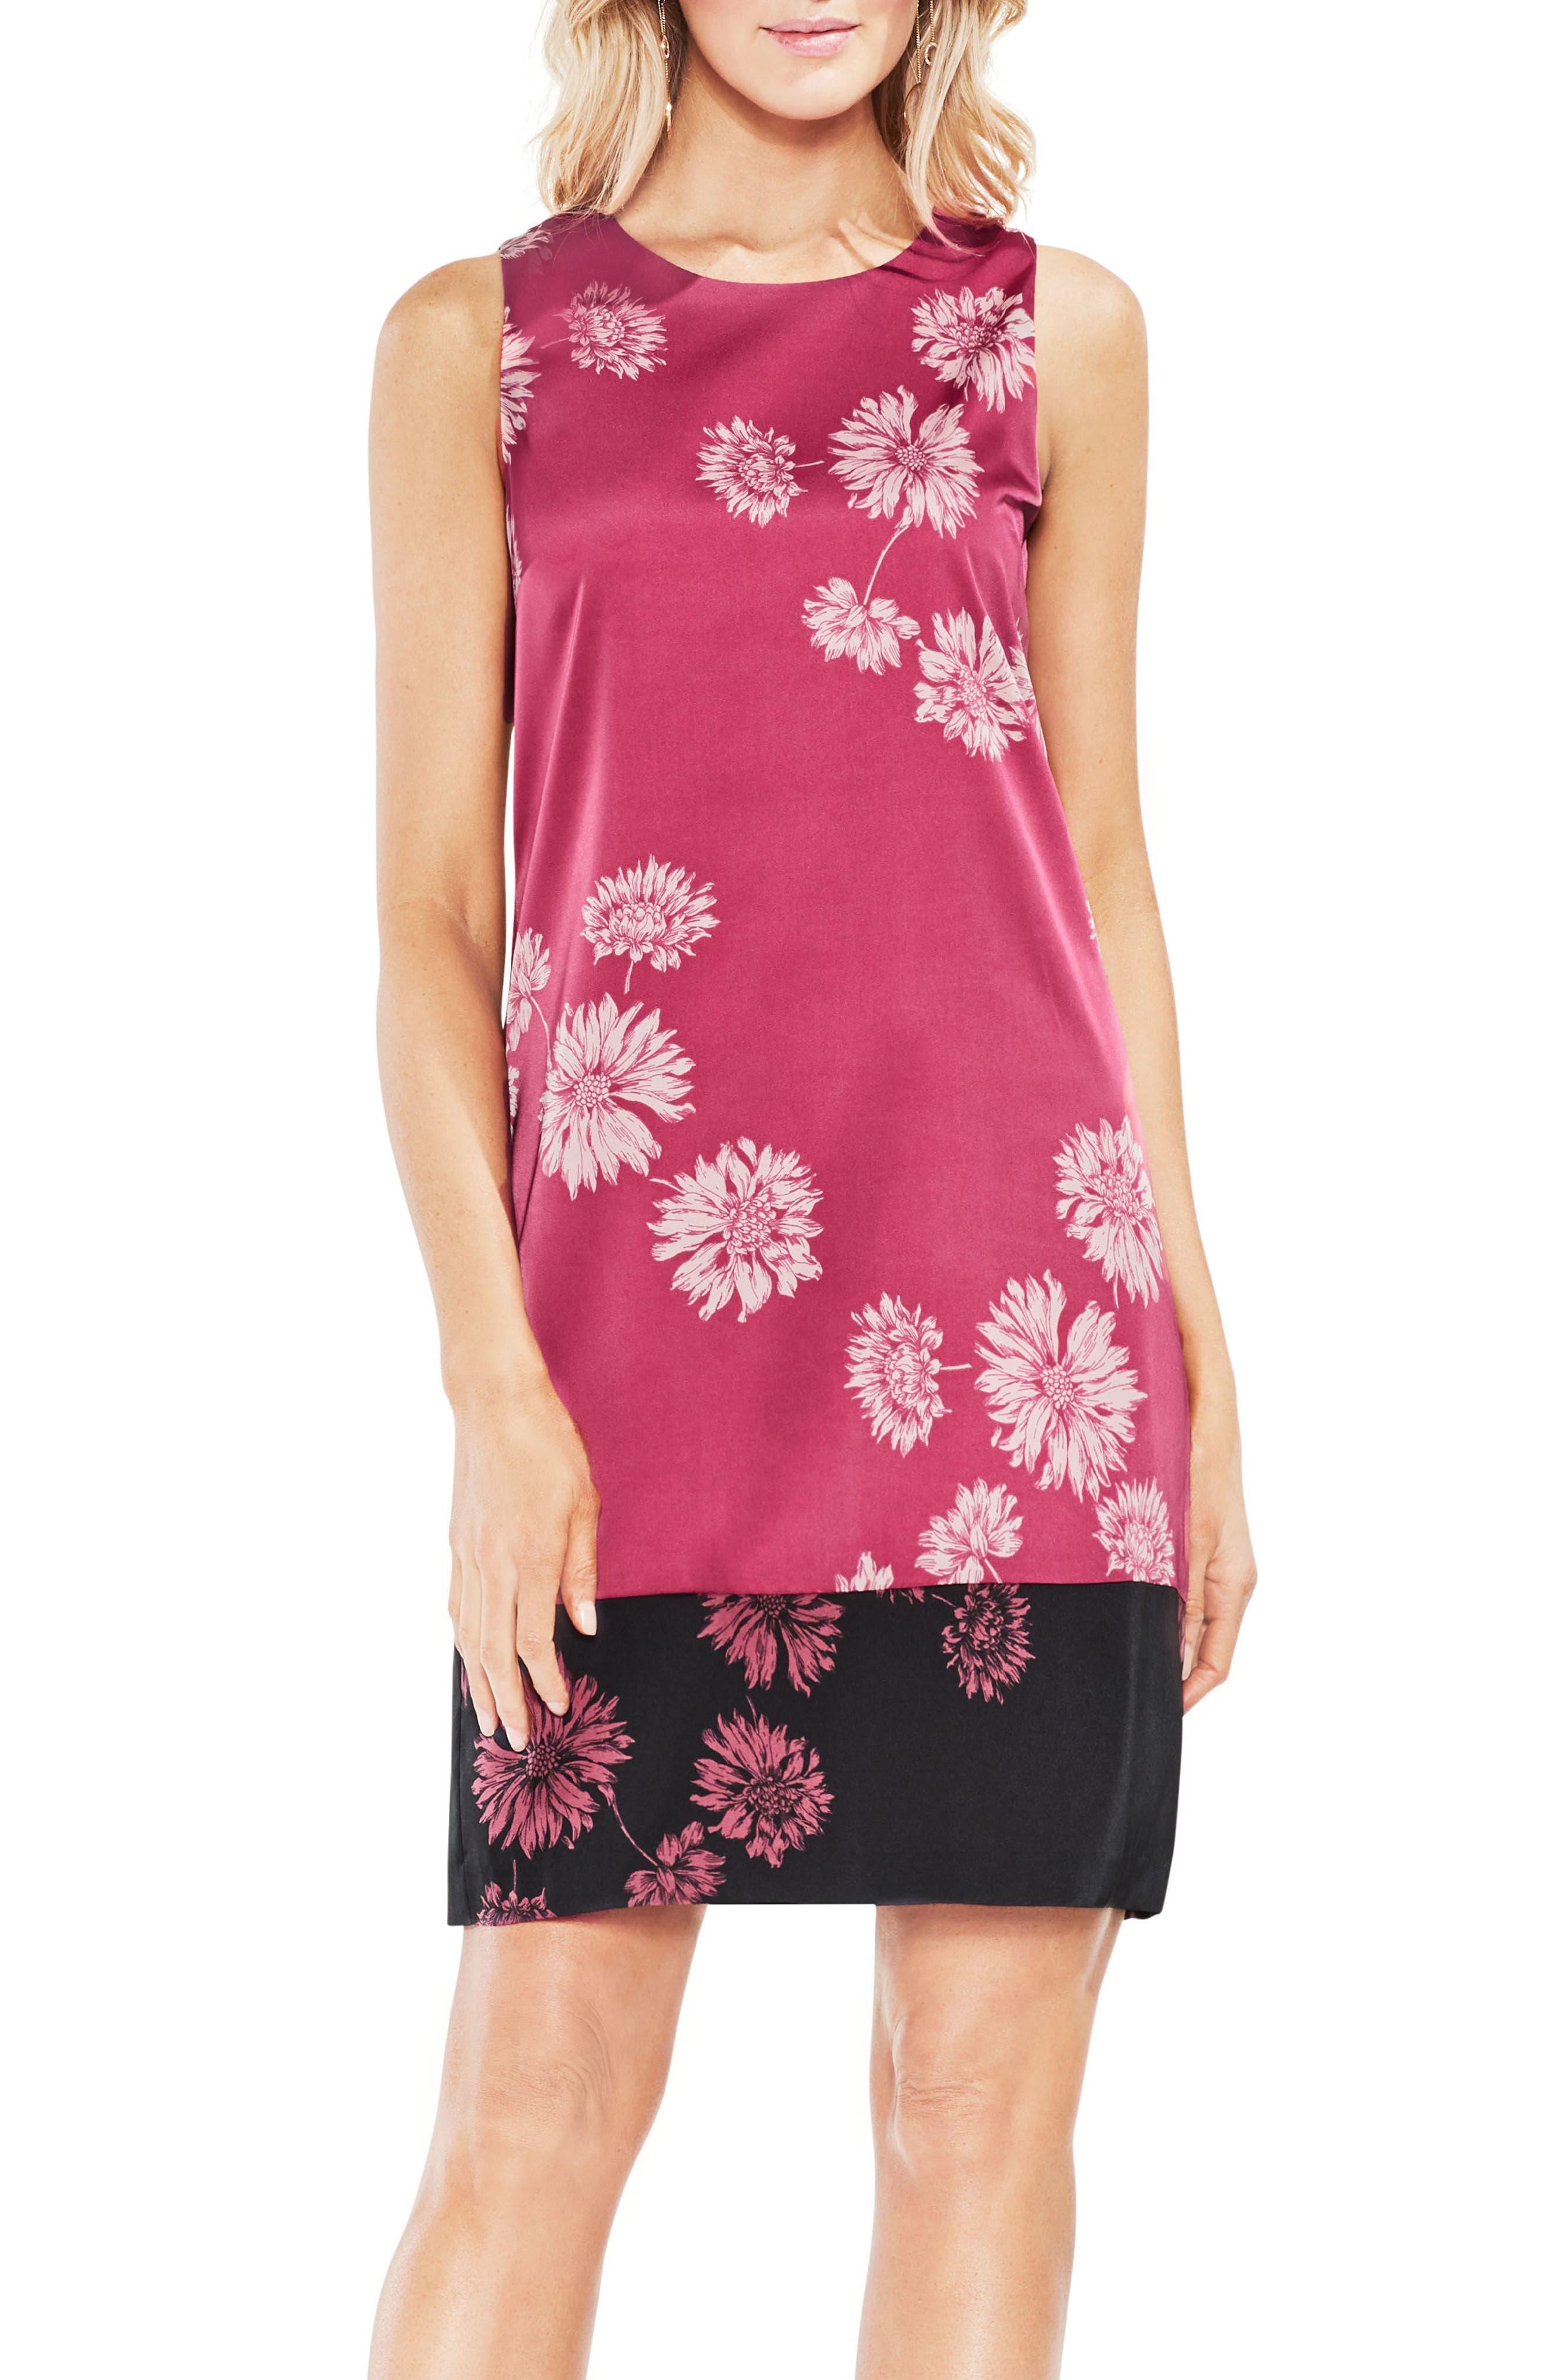 Chateau Floral Shift Dress,                             Main thumbnail 1, color,                             888-Pink Rose